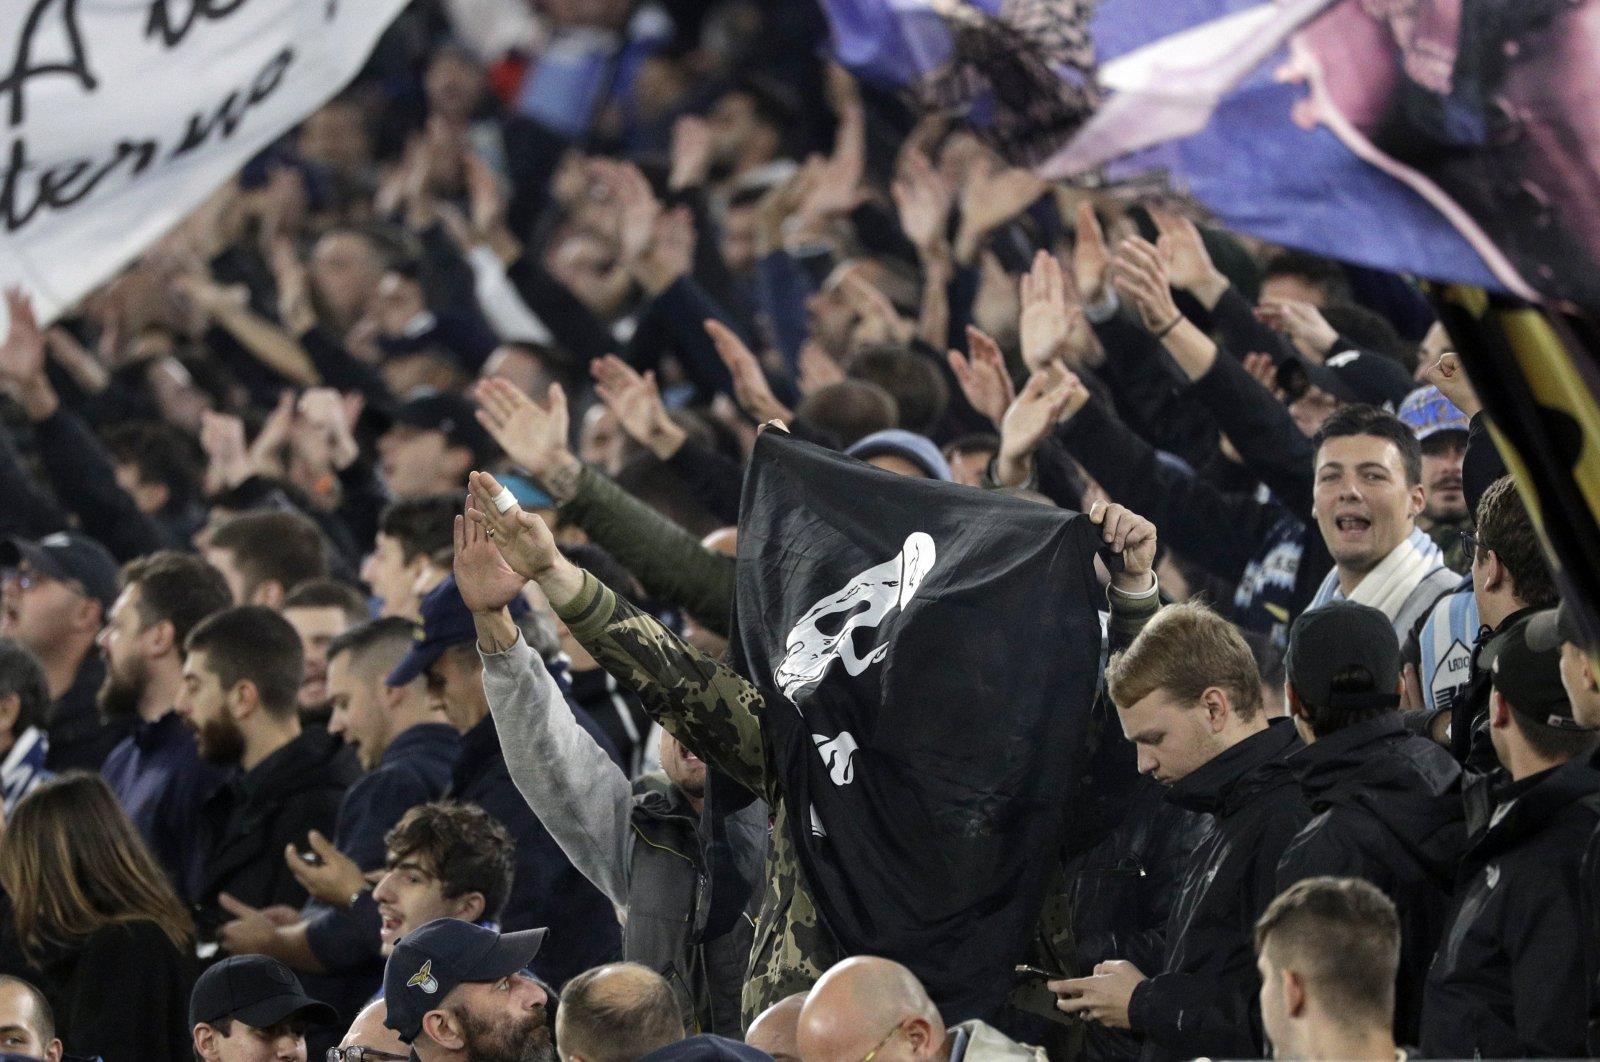 Lazio fans make fascist salutes ahead of a Europa League group E soccer match between Lazio and Celtic, at Olympic Stadium, Rome, Italy, Nov. 7, 2019. (AP Photo)